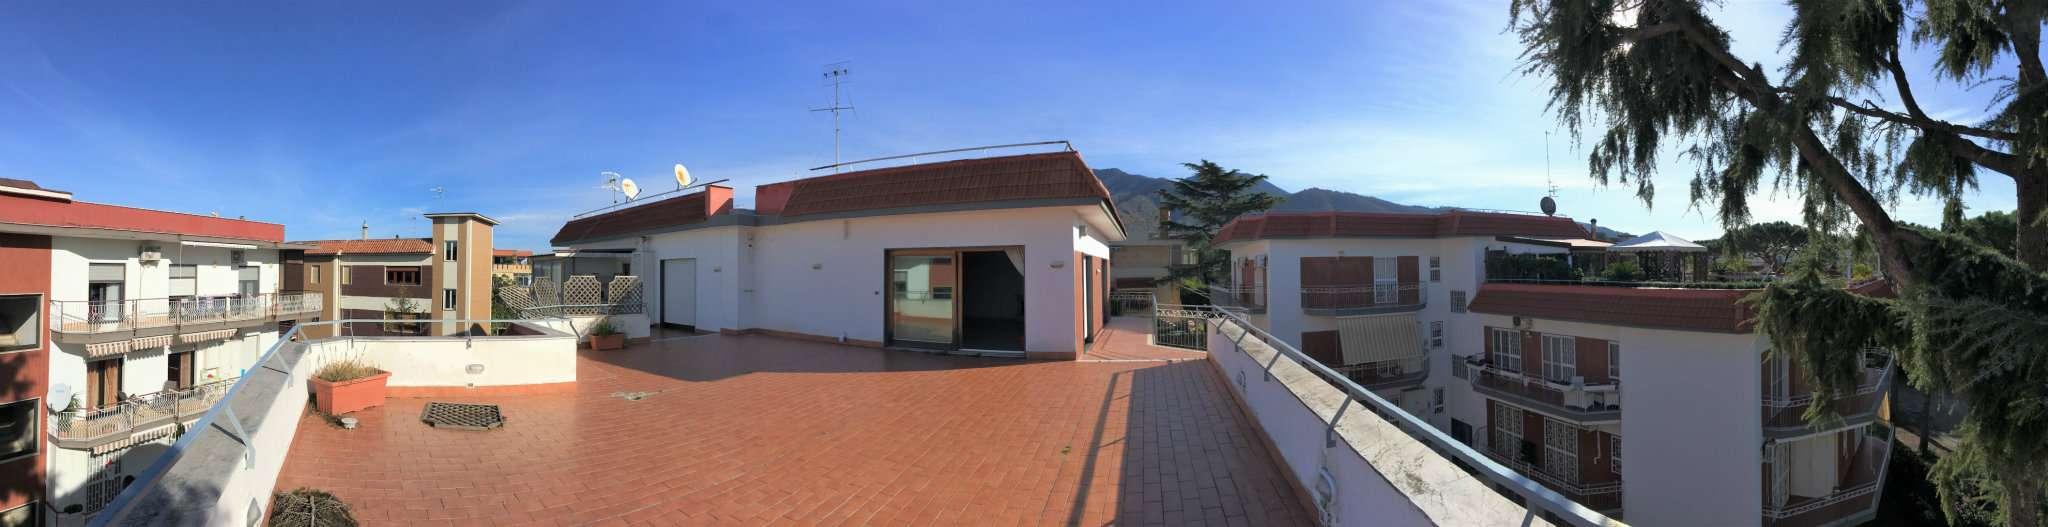 Attico / Mansarda in Vendita a San Sebastiano al Vesuvio